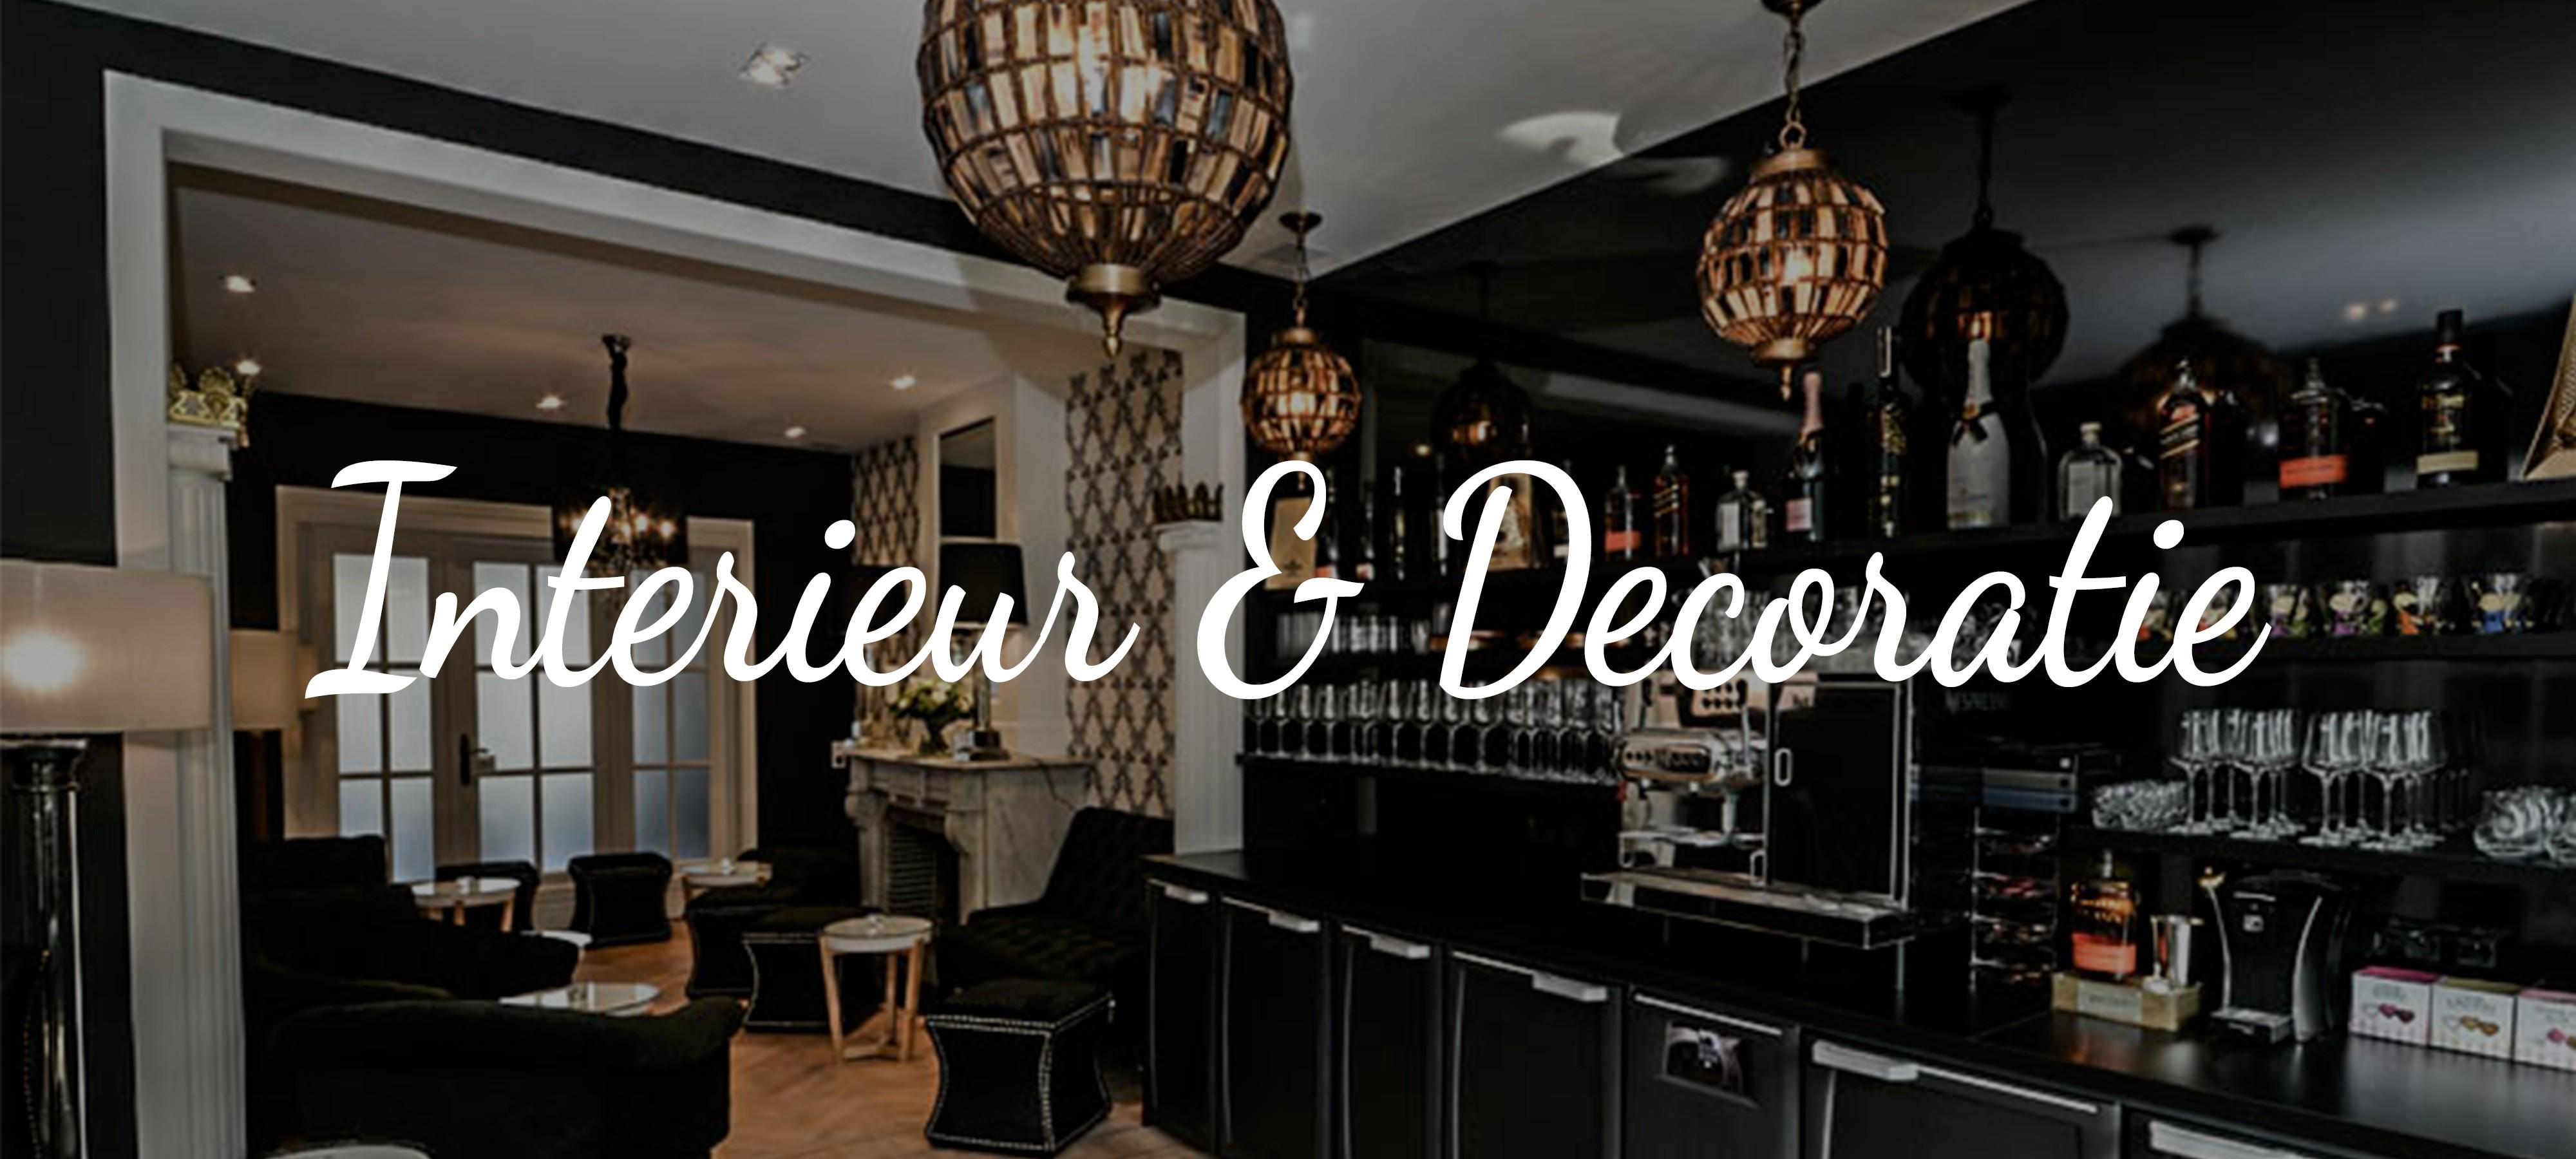 F Design & Lounge - Interieur & decoratie Aalst - Inforegio.be